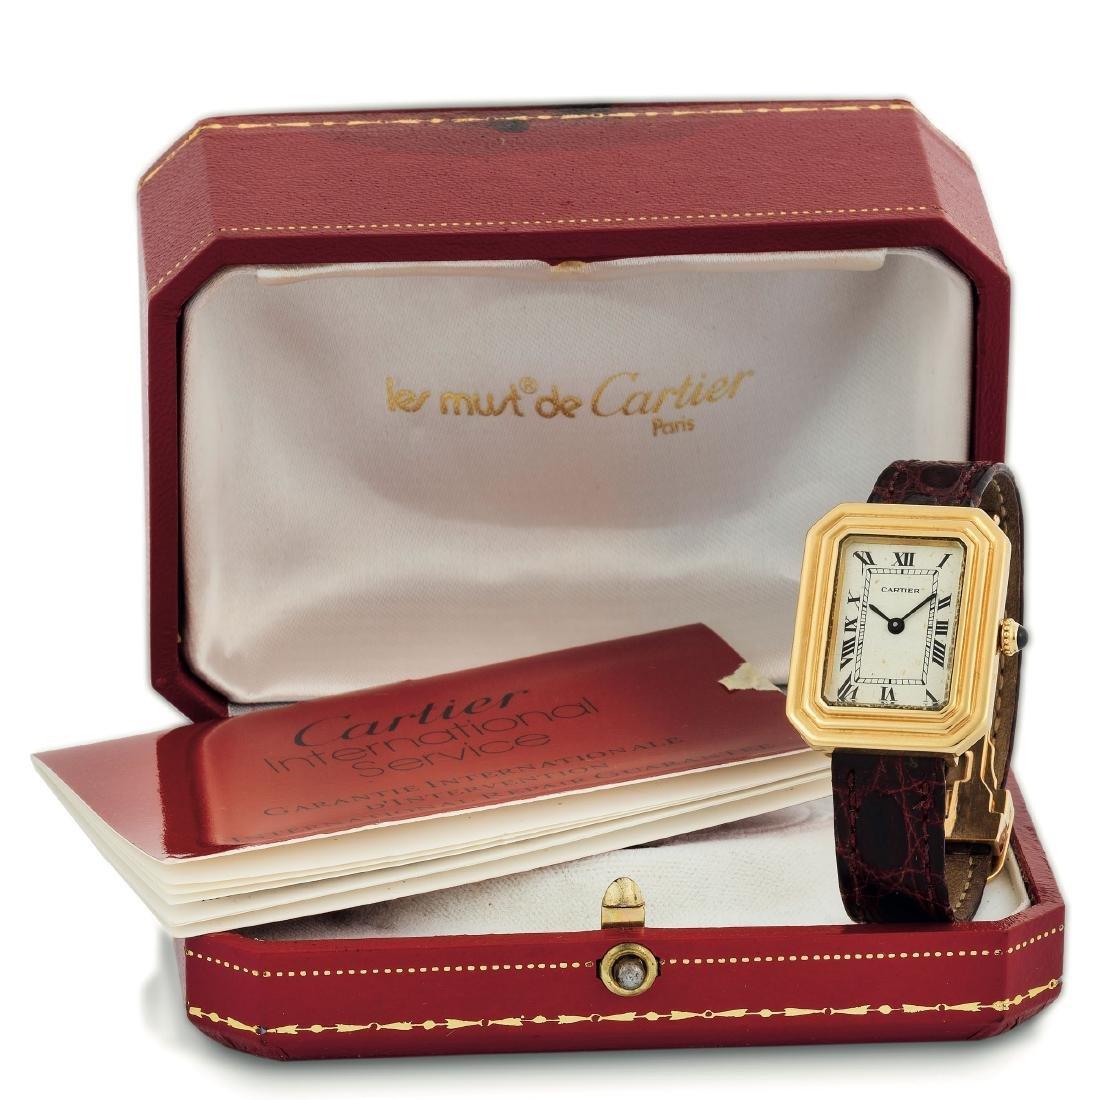 Cartier, Paris. Fine, rectangular, 18K yellow gold